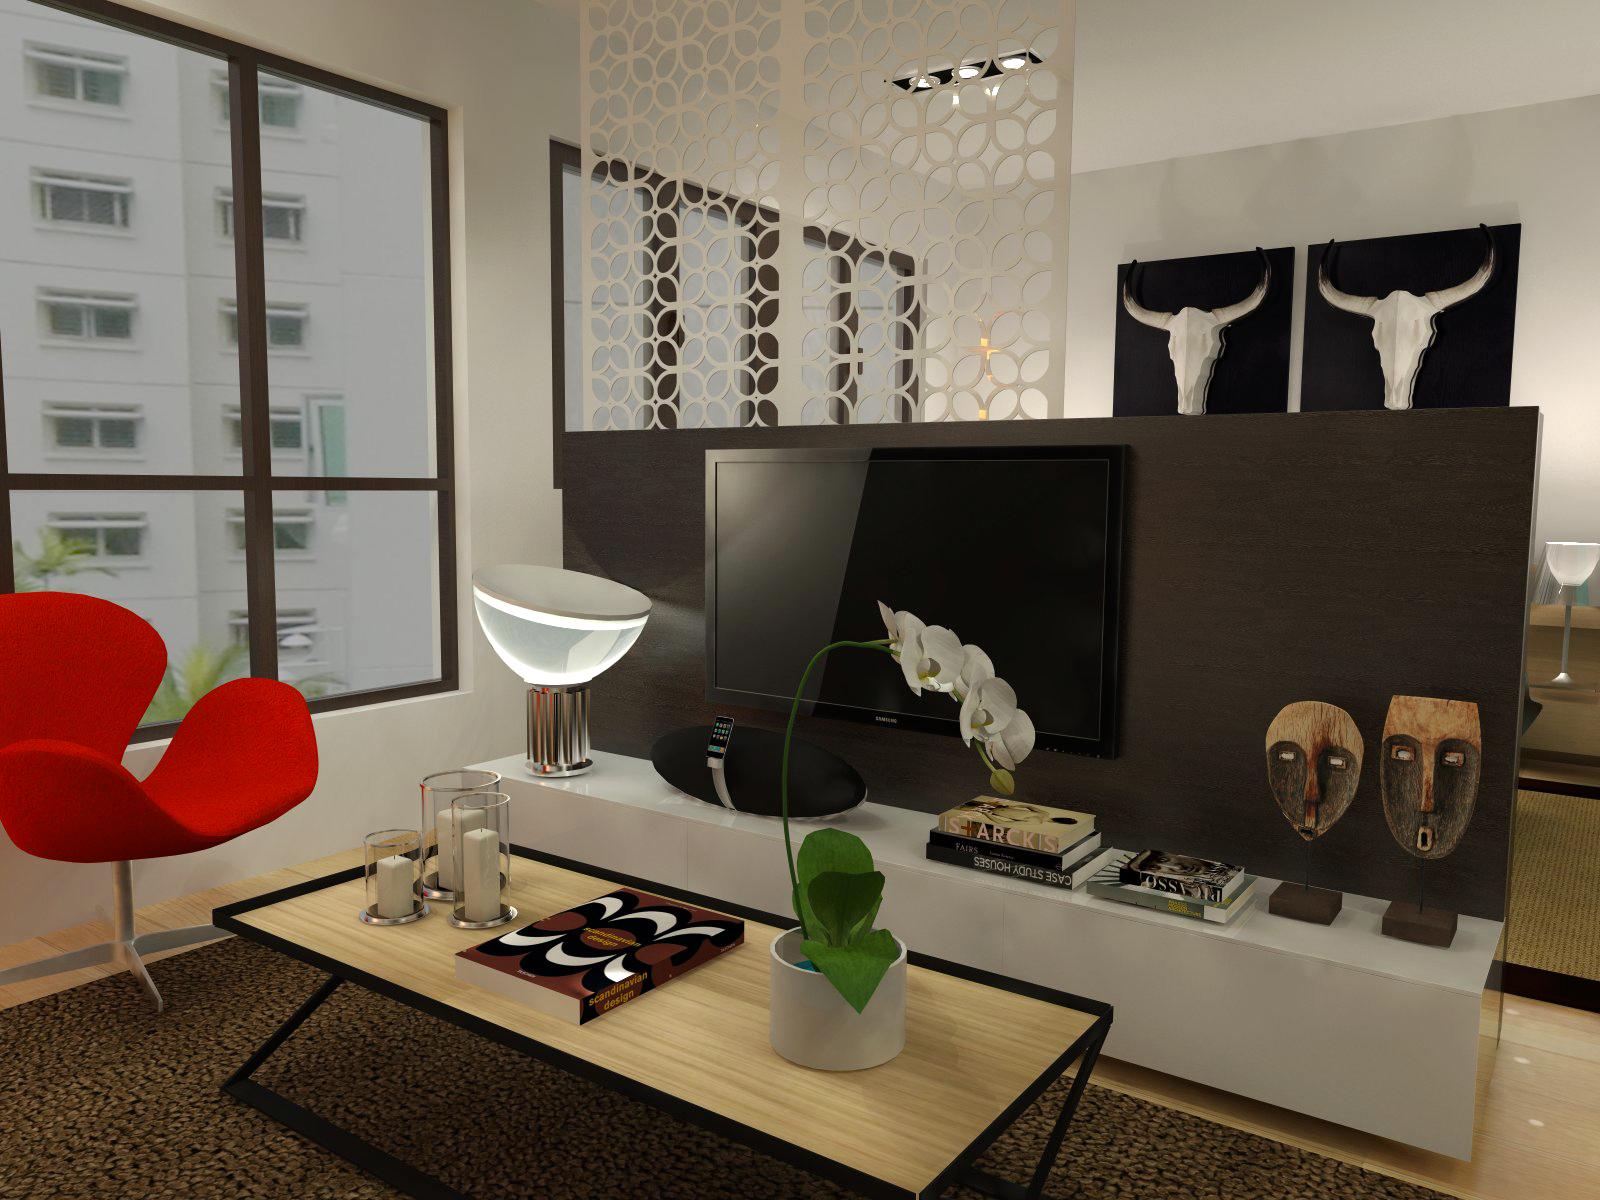 Superb HDB Fernvale River Walk 2 Room Apartment U2013 47 Sqm U2013 Living Room 2  HDRI Awesome Ideas